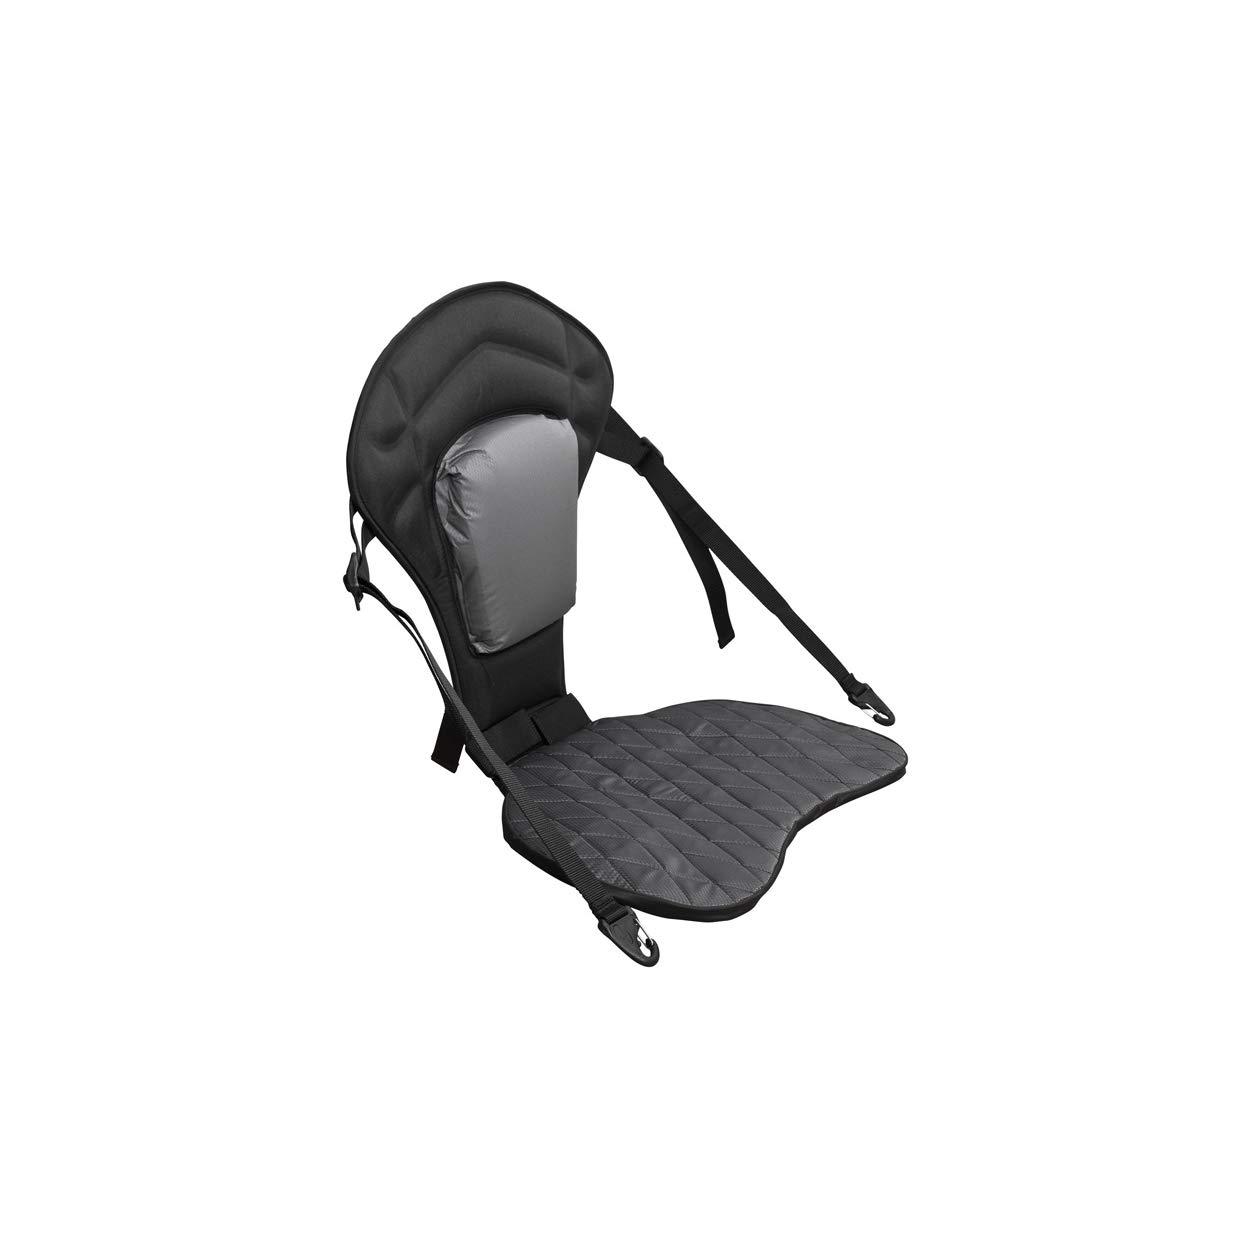 Hobie Mirage Seat - Twist Lock